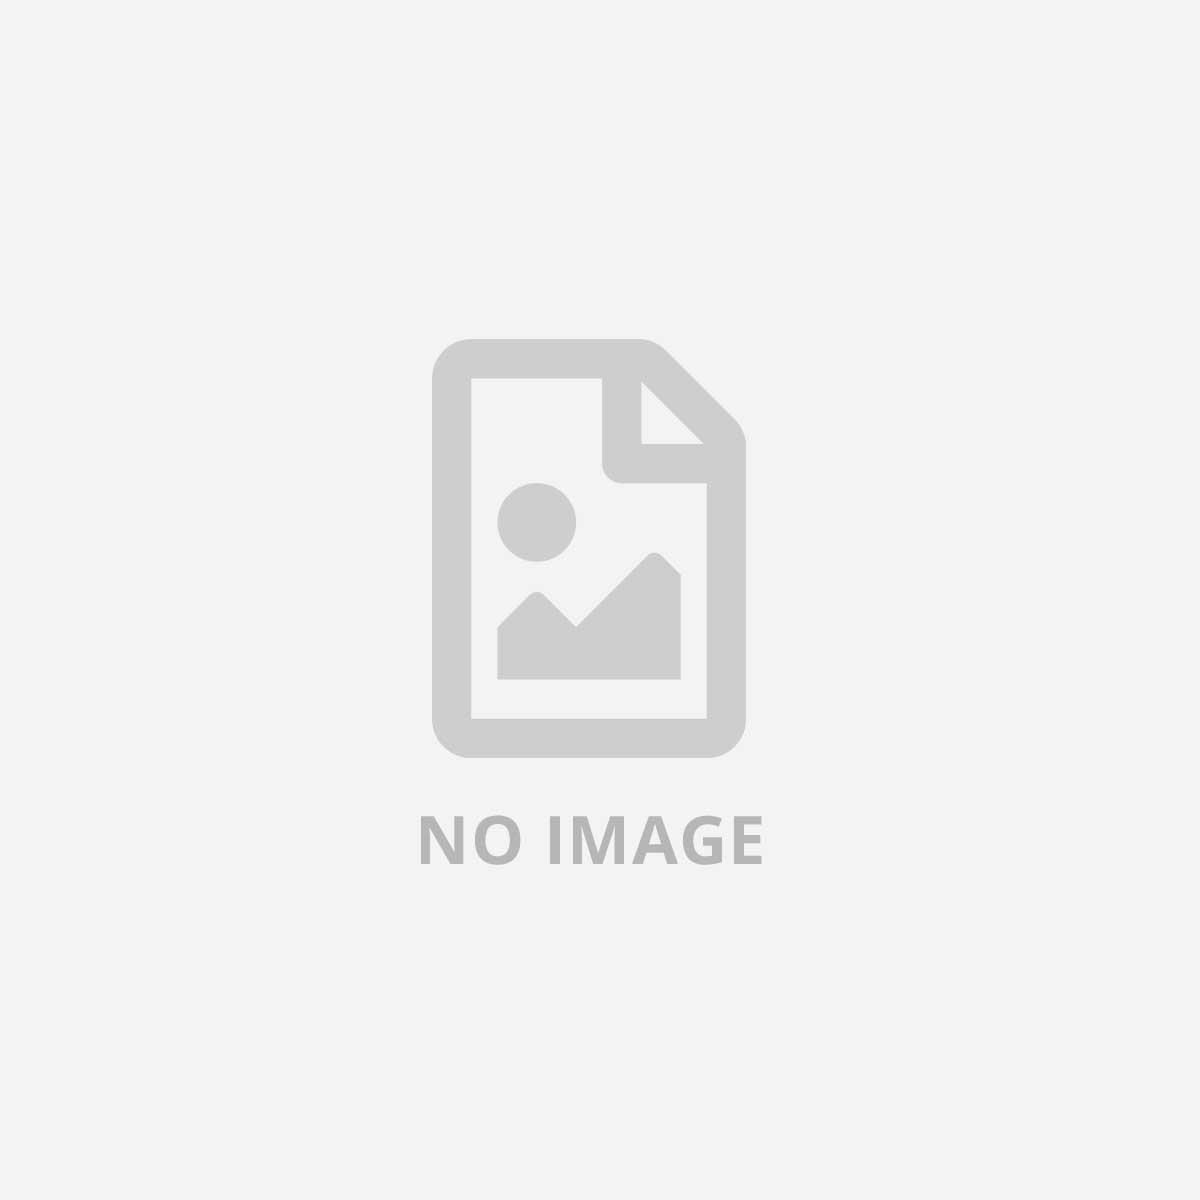 HP INC SAM CLT-W406 TONER COLLECTION UNIT